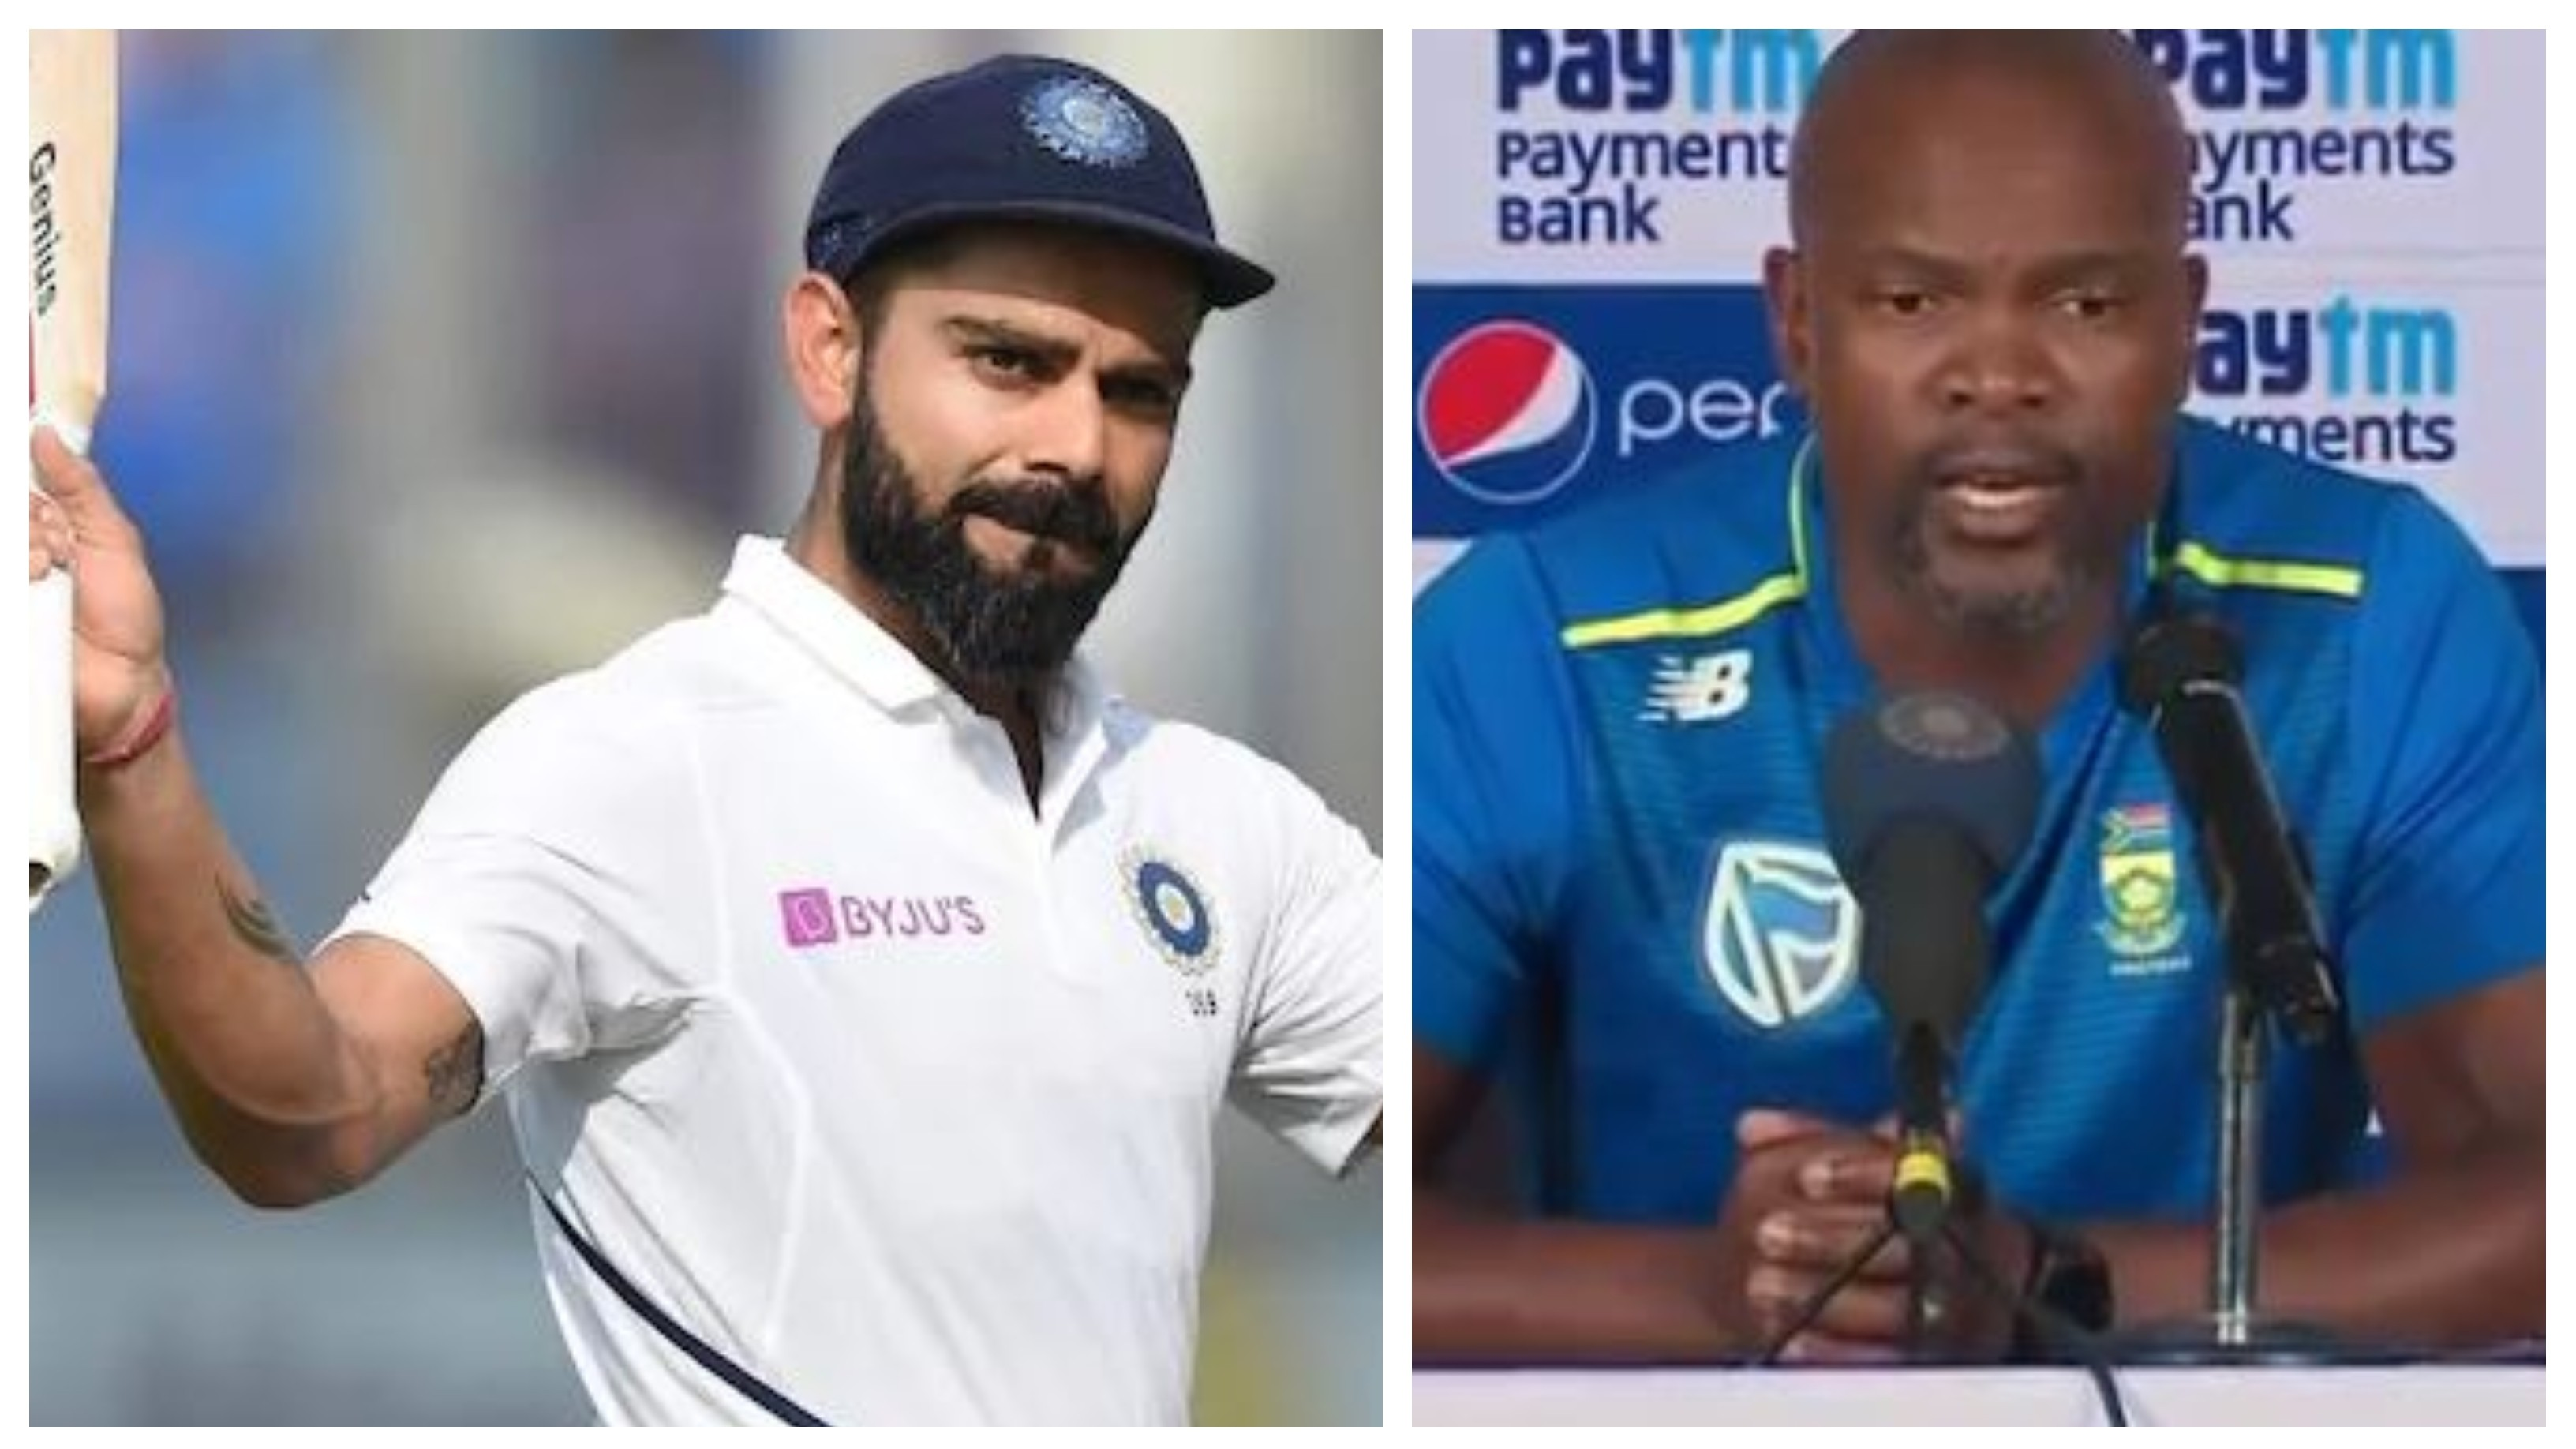 IND v SA 2019: South Africa coach hails